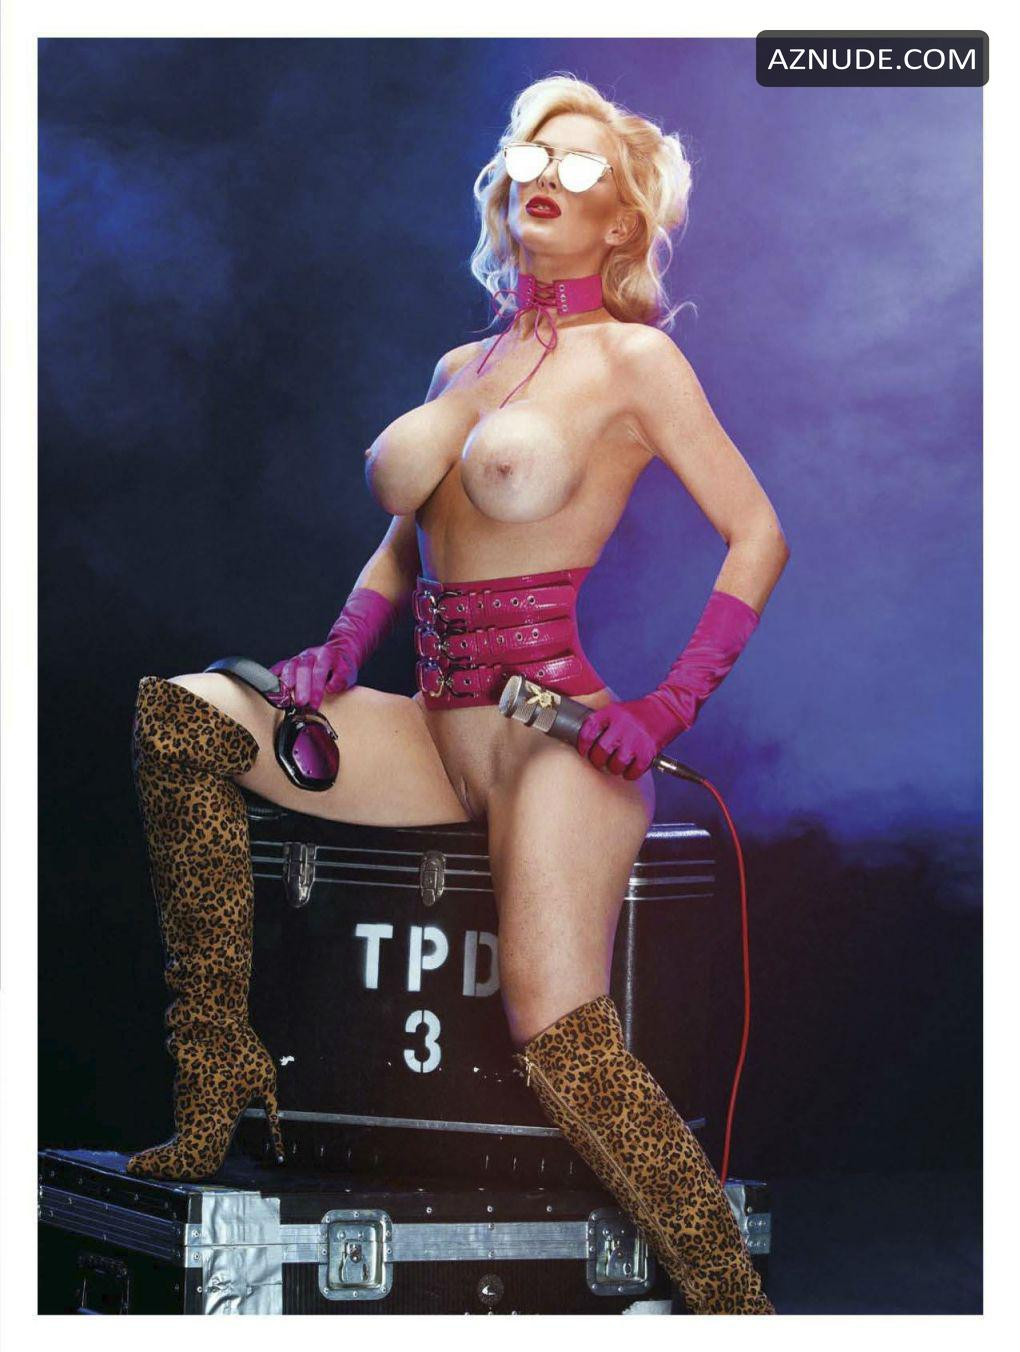 Andrea Prince Sex andrea prince nude - aznude